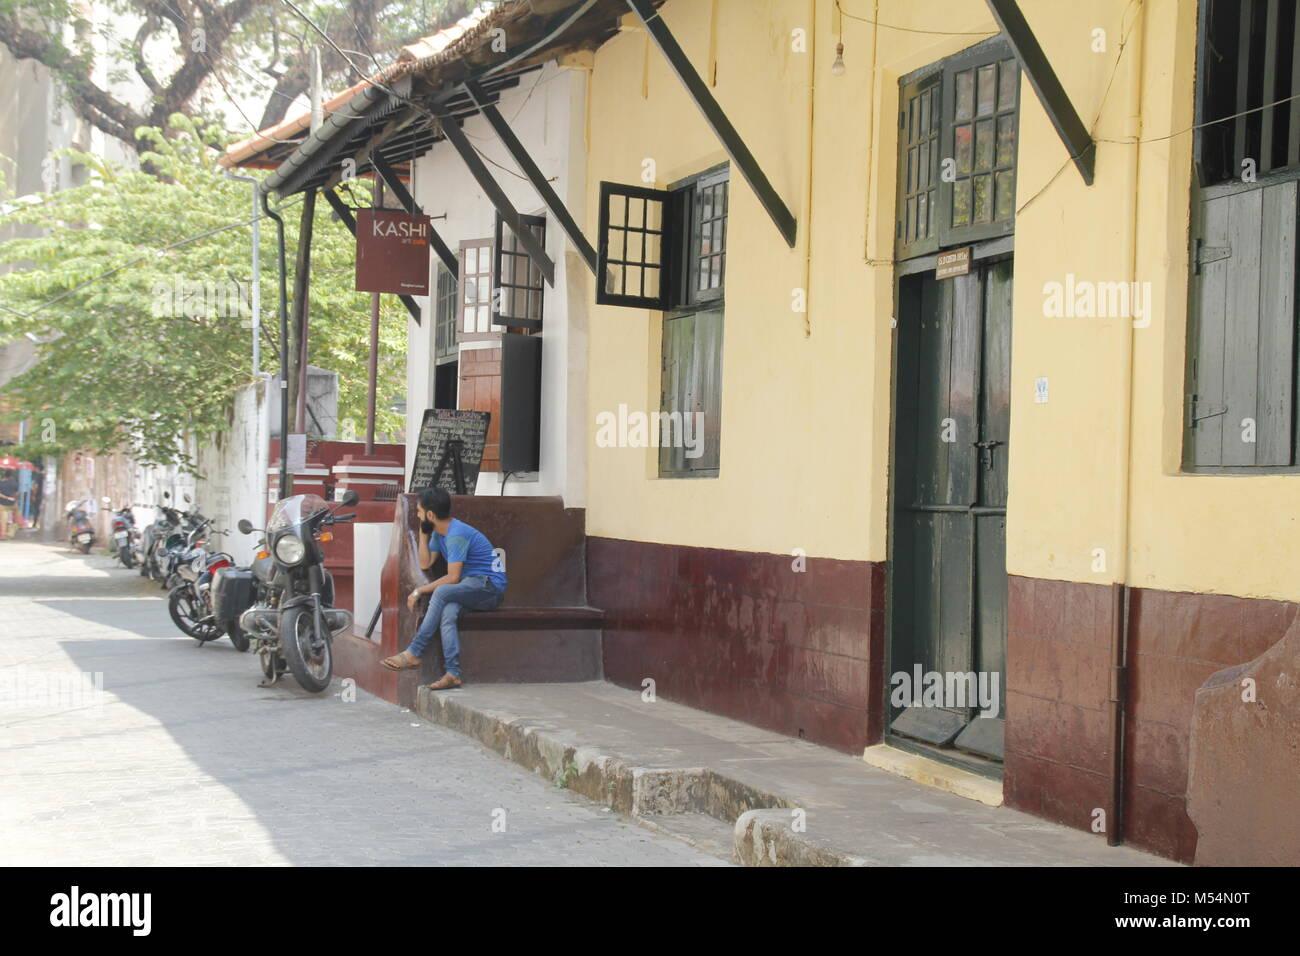 The streets of Fort Kochi, Kerala, India - Stock Image